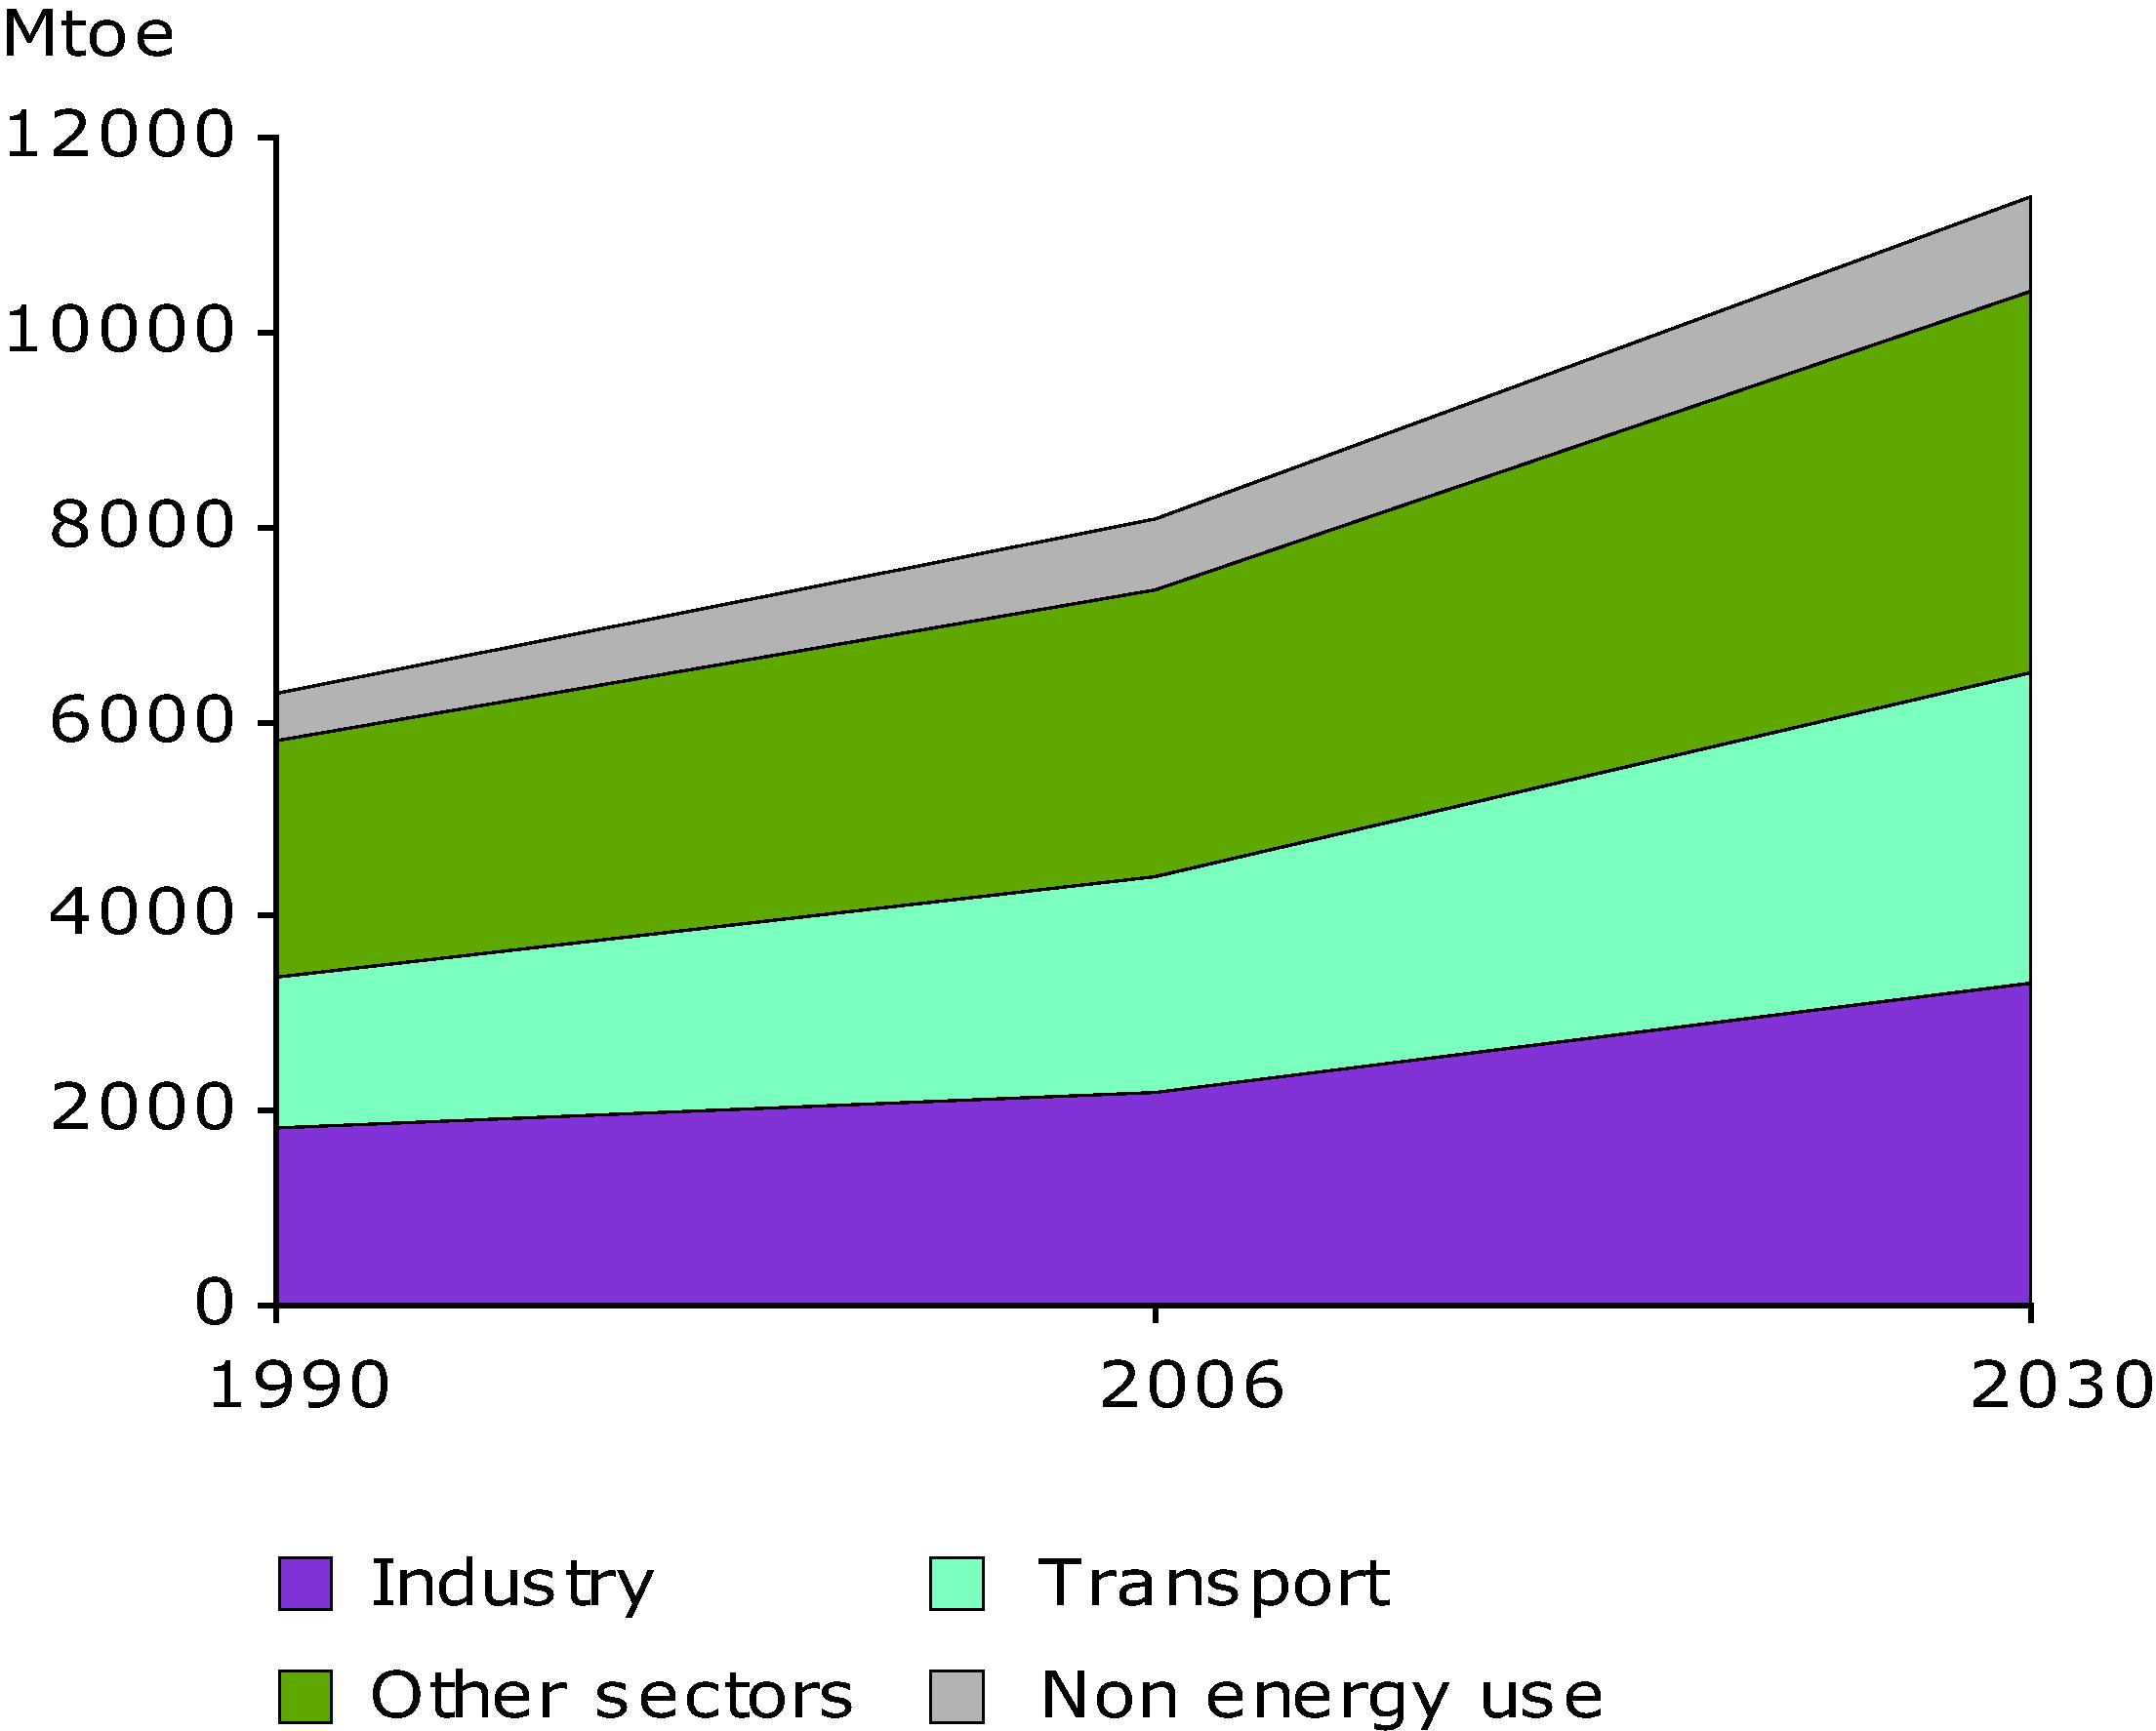 Global Final Energy Consumption 1990-2030